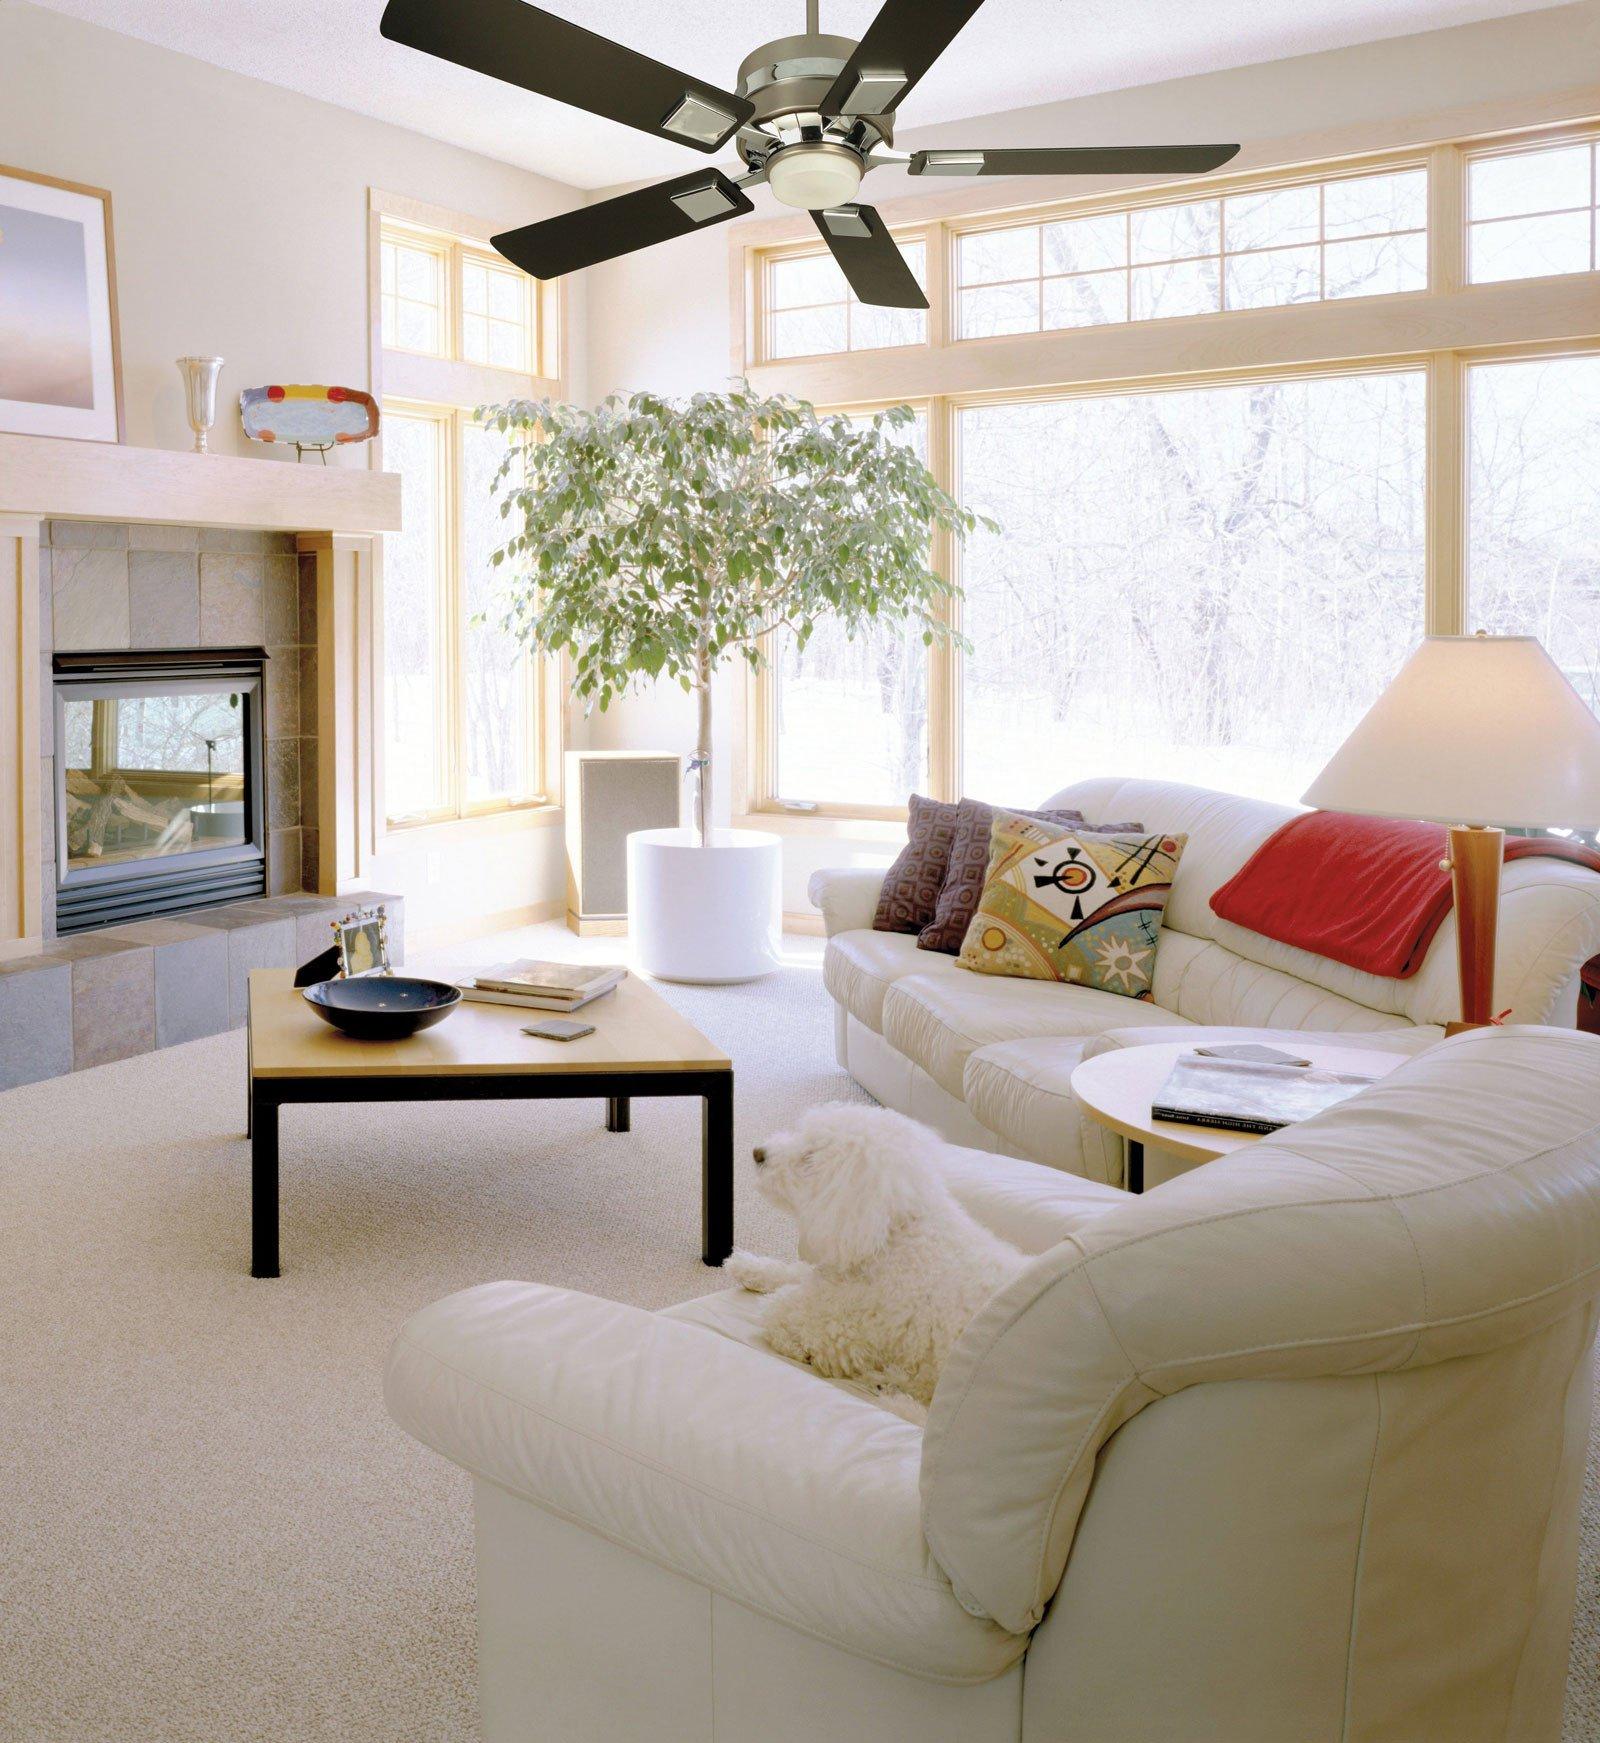 Small Living Room Interior Design Fresh Modern Ceiling Fan with Stunning Visual Amaza Design